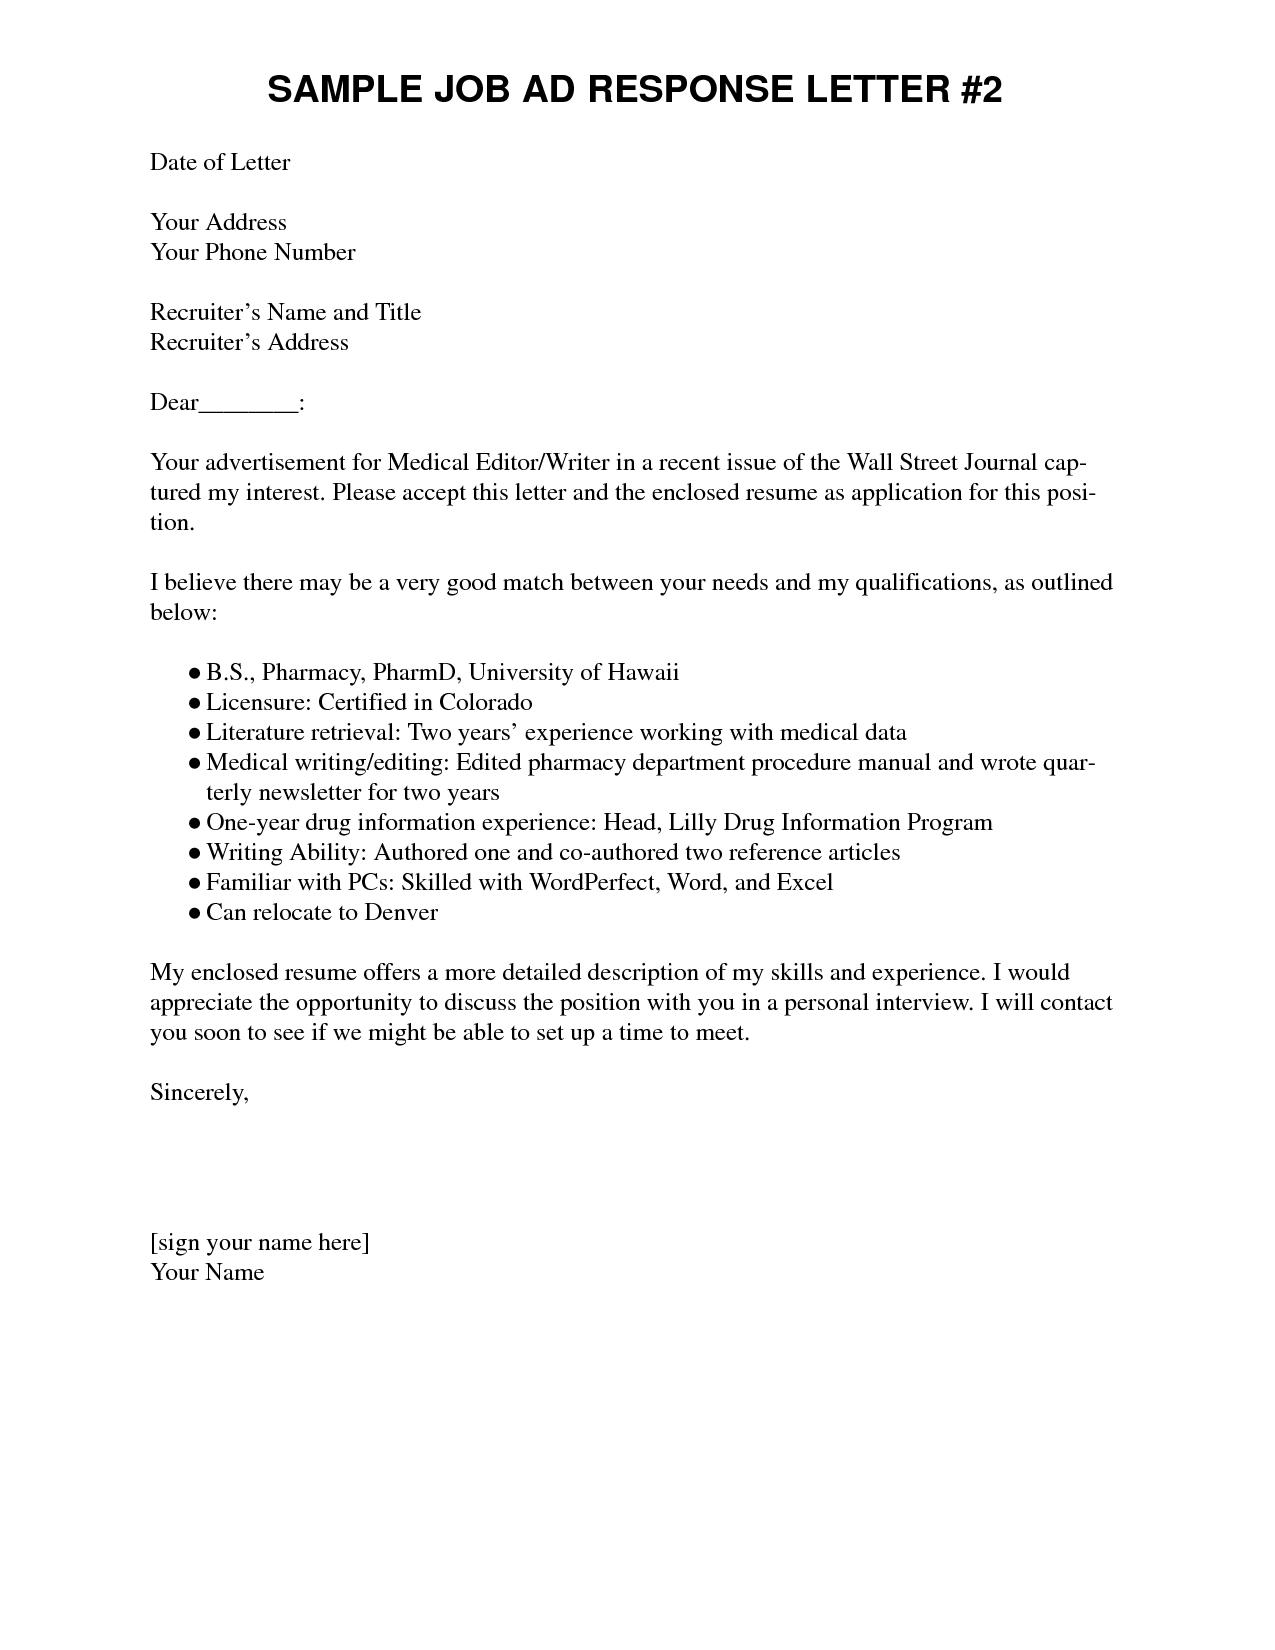 Negotiation Worksheet Template